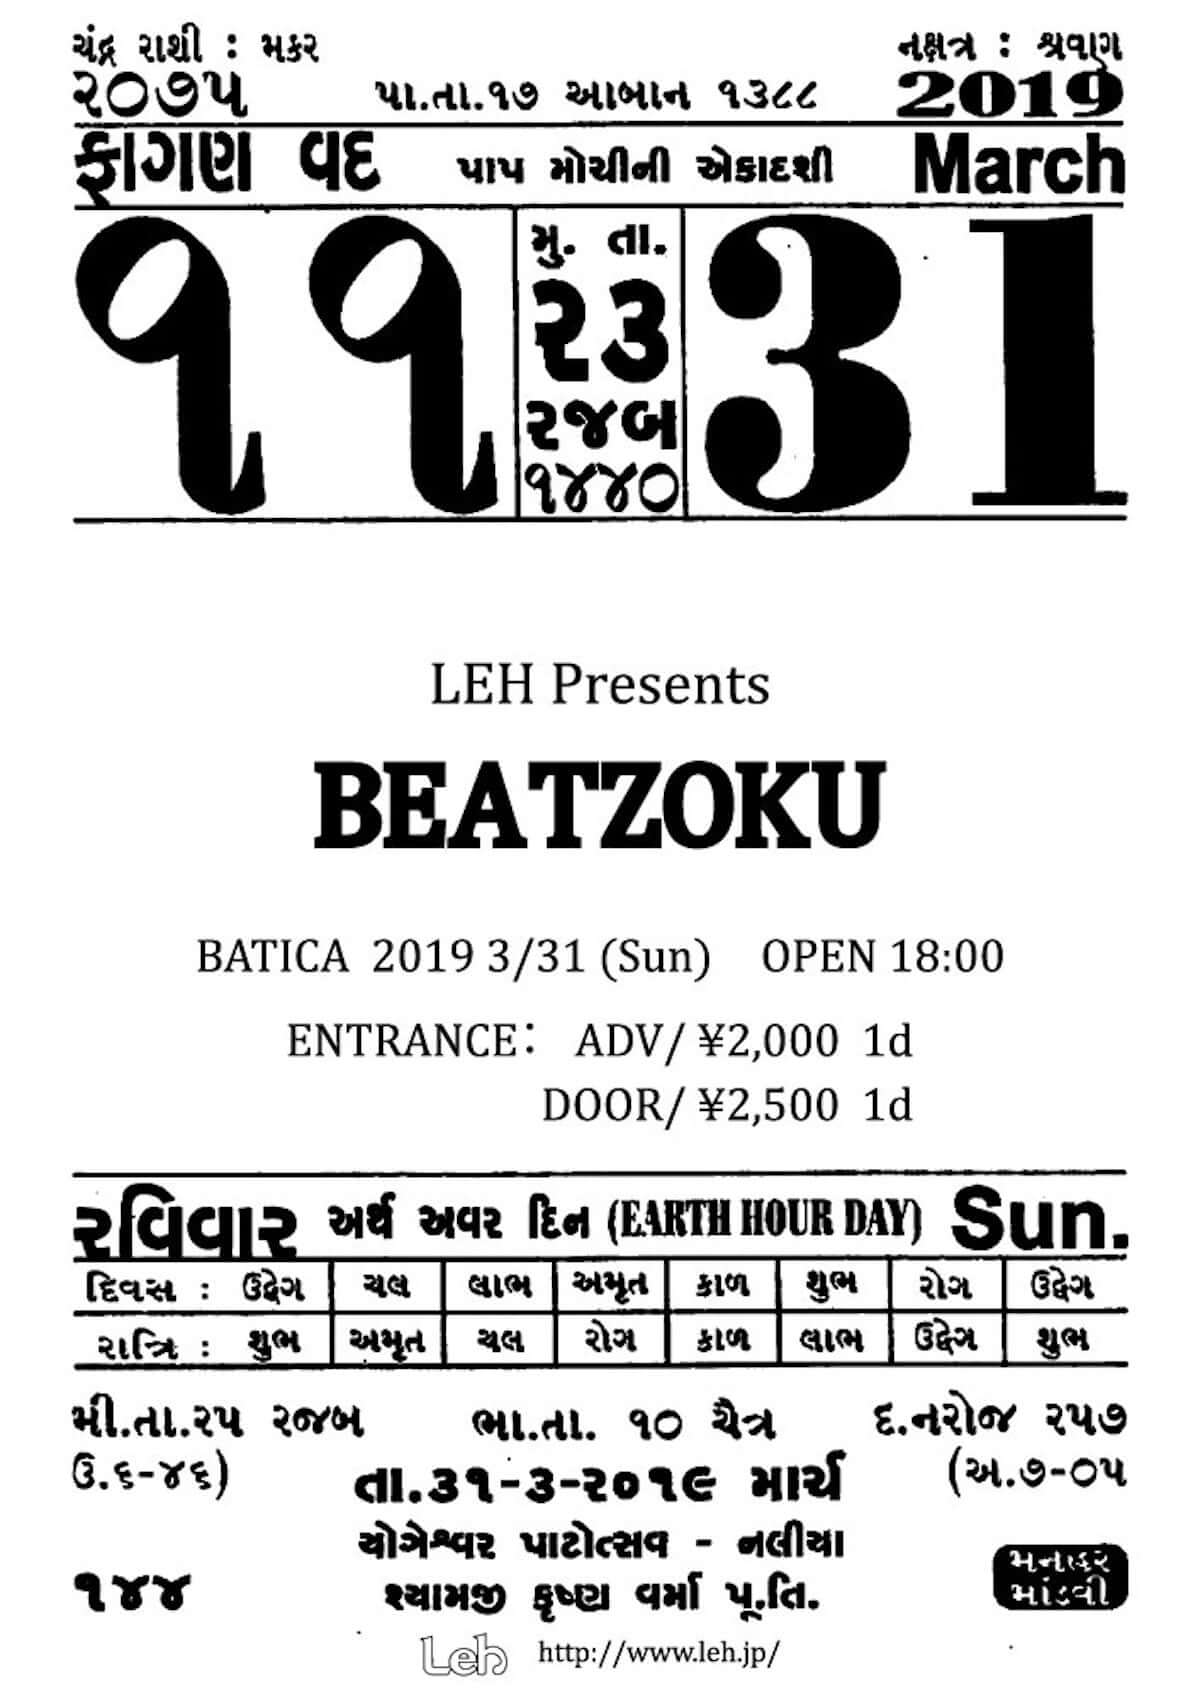 miu(ミユ)や仙人掌がモデルを務めるブランドLehが音楽イベント「BEATZOKU」を恵比寿BATICAにて開催 music190318-leh-5-1200x1697